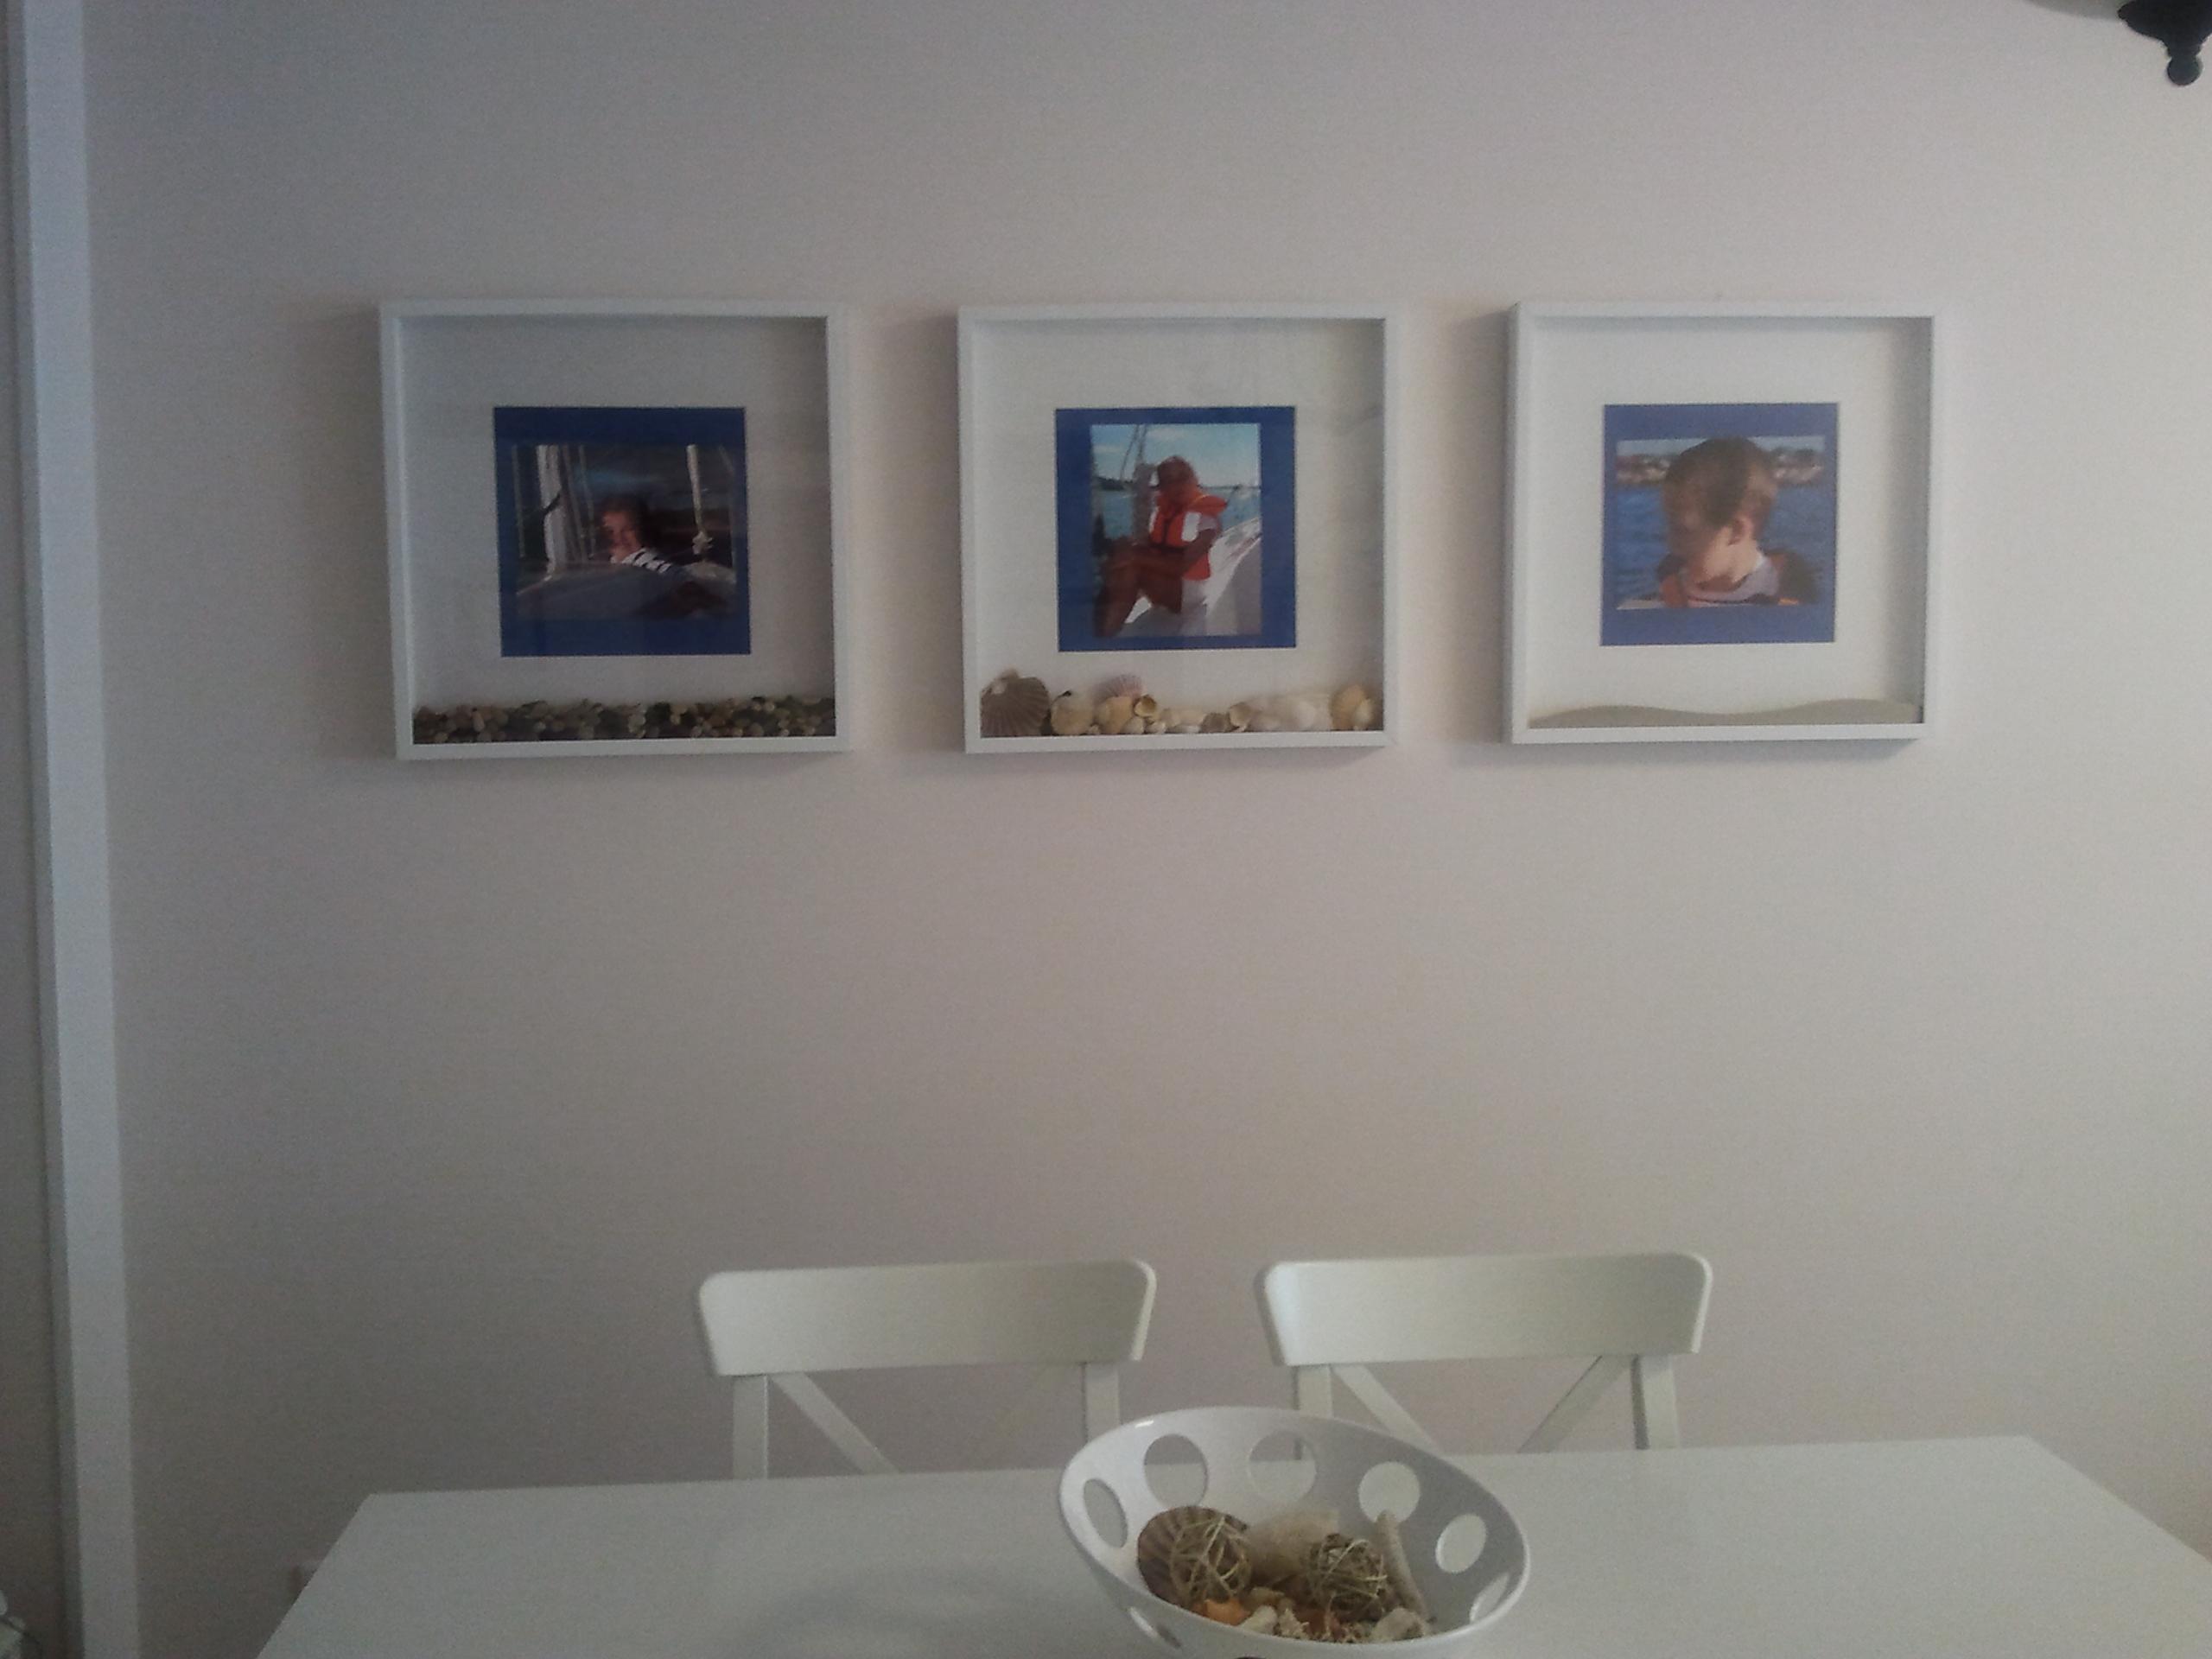 Ikea Marcos De Fotos. Ikea Hemnes Bed Frame White Item With Ikea ...